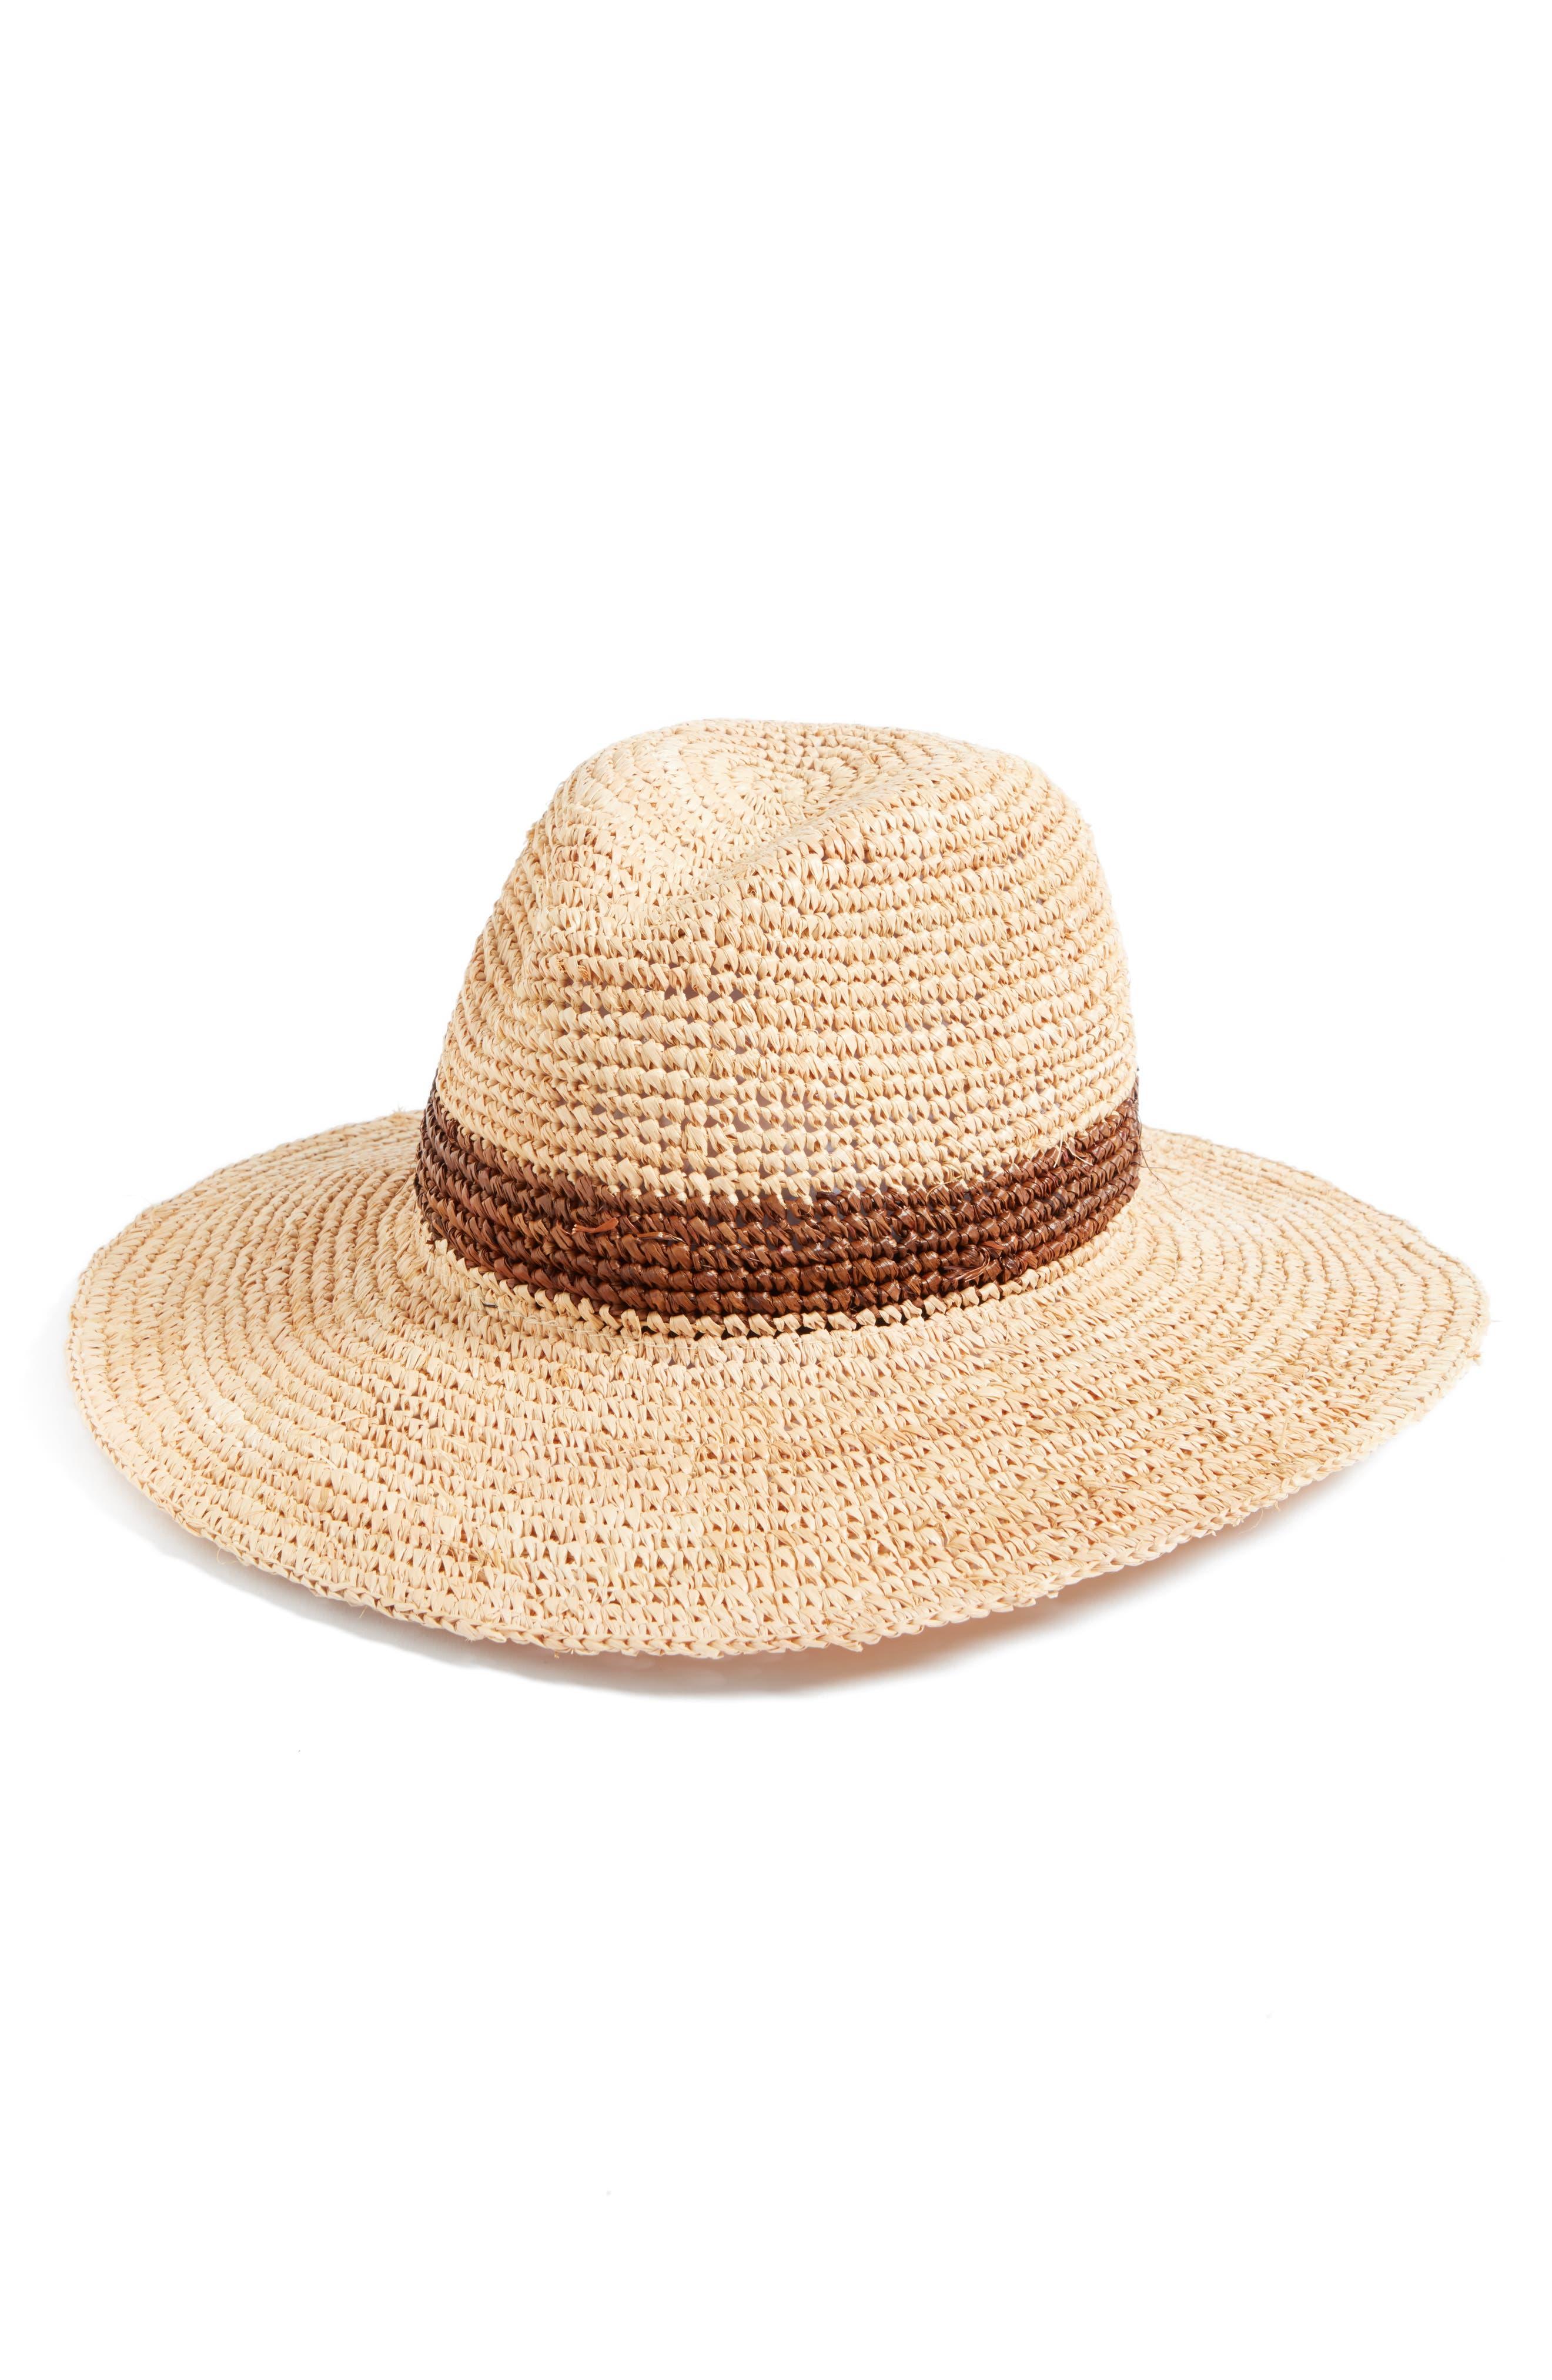 Stanton Raffia Safari Hat,                             Main thumbnail 1, color,                             Brown